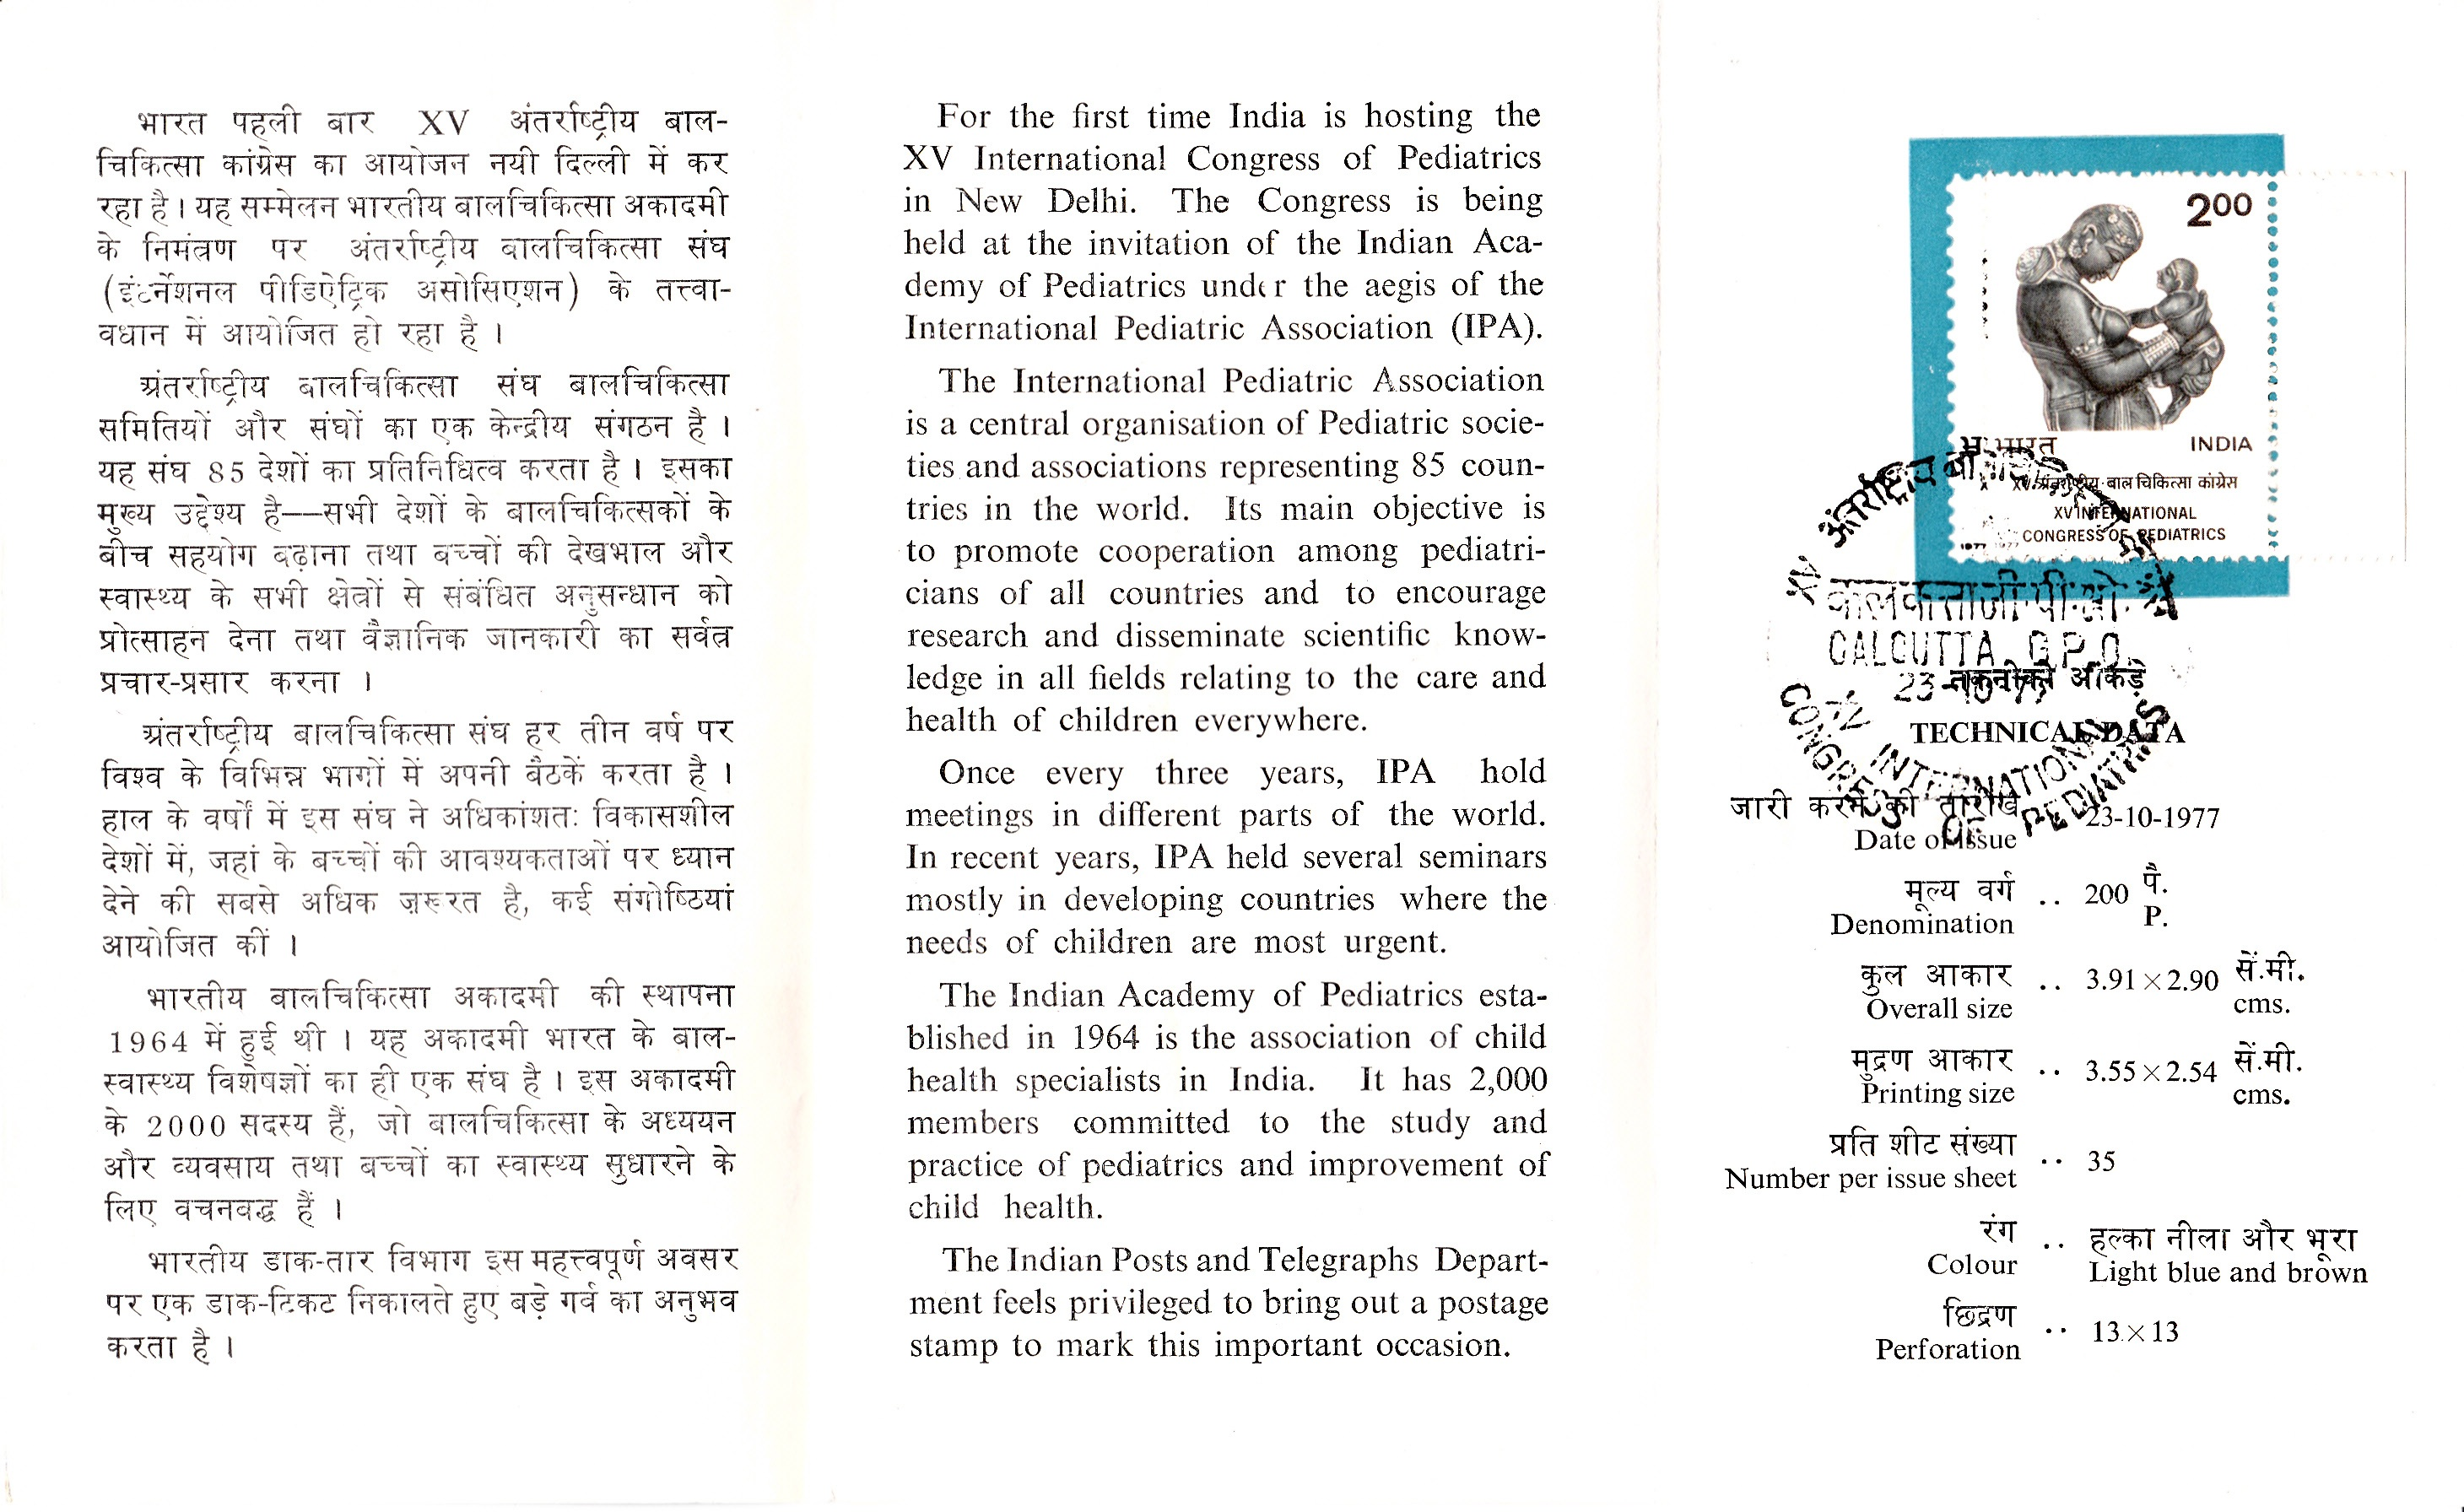 XV International Congress of Pediatrics Brochure 002